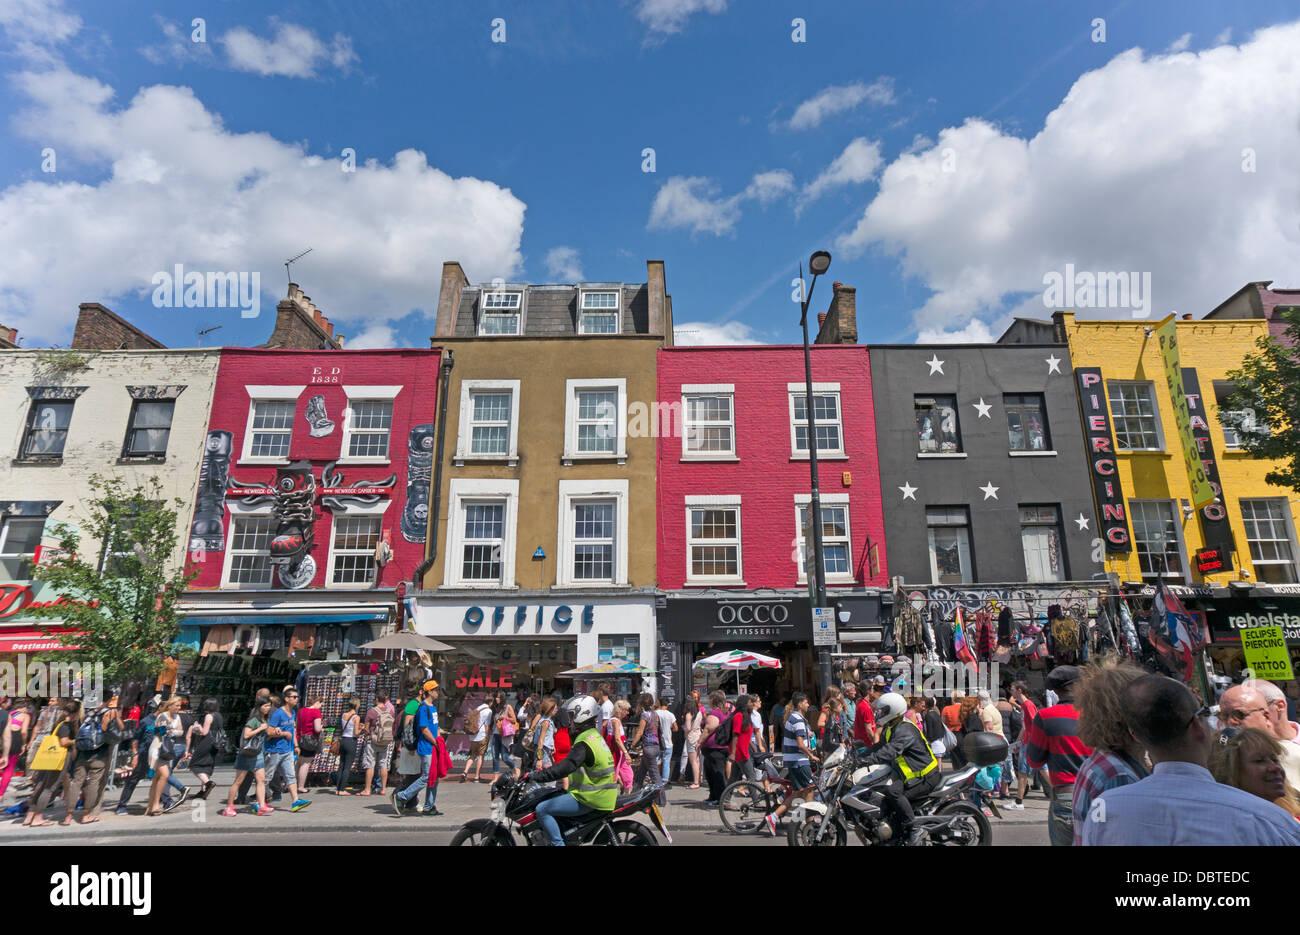 A colourful shopping parade in the summer sunshine, on a busy Camden high street, near Camden Market, London, England, - Stock Image